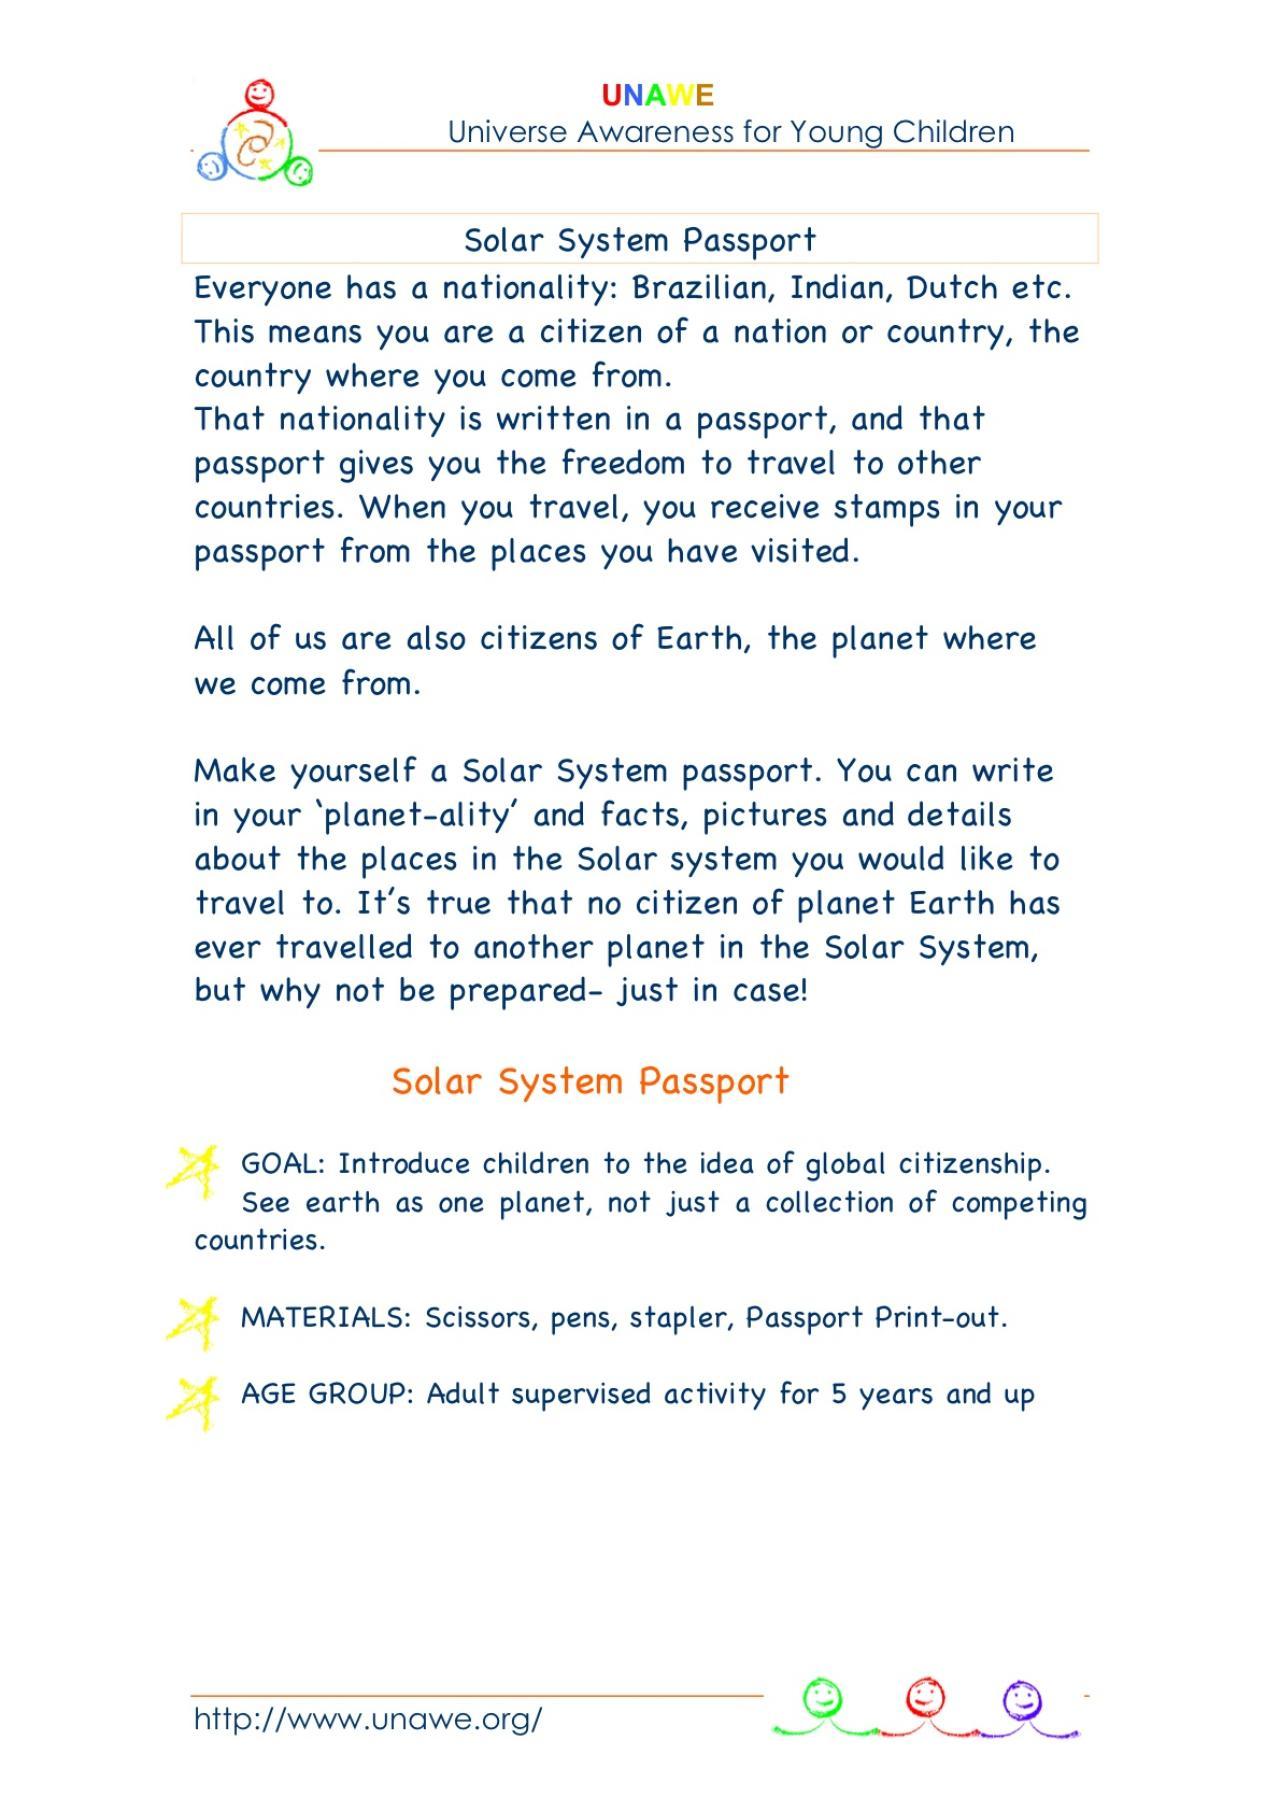 solar system passport activity